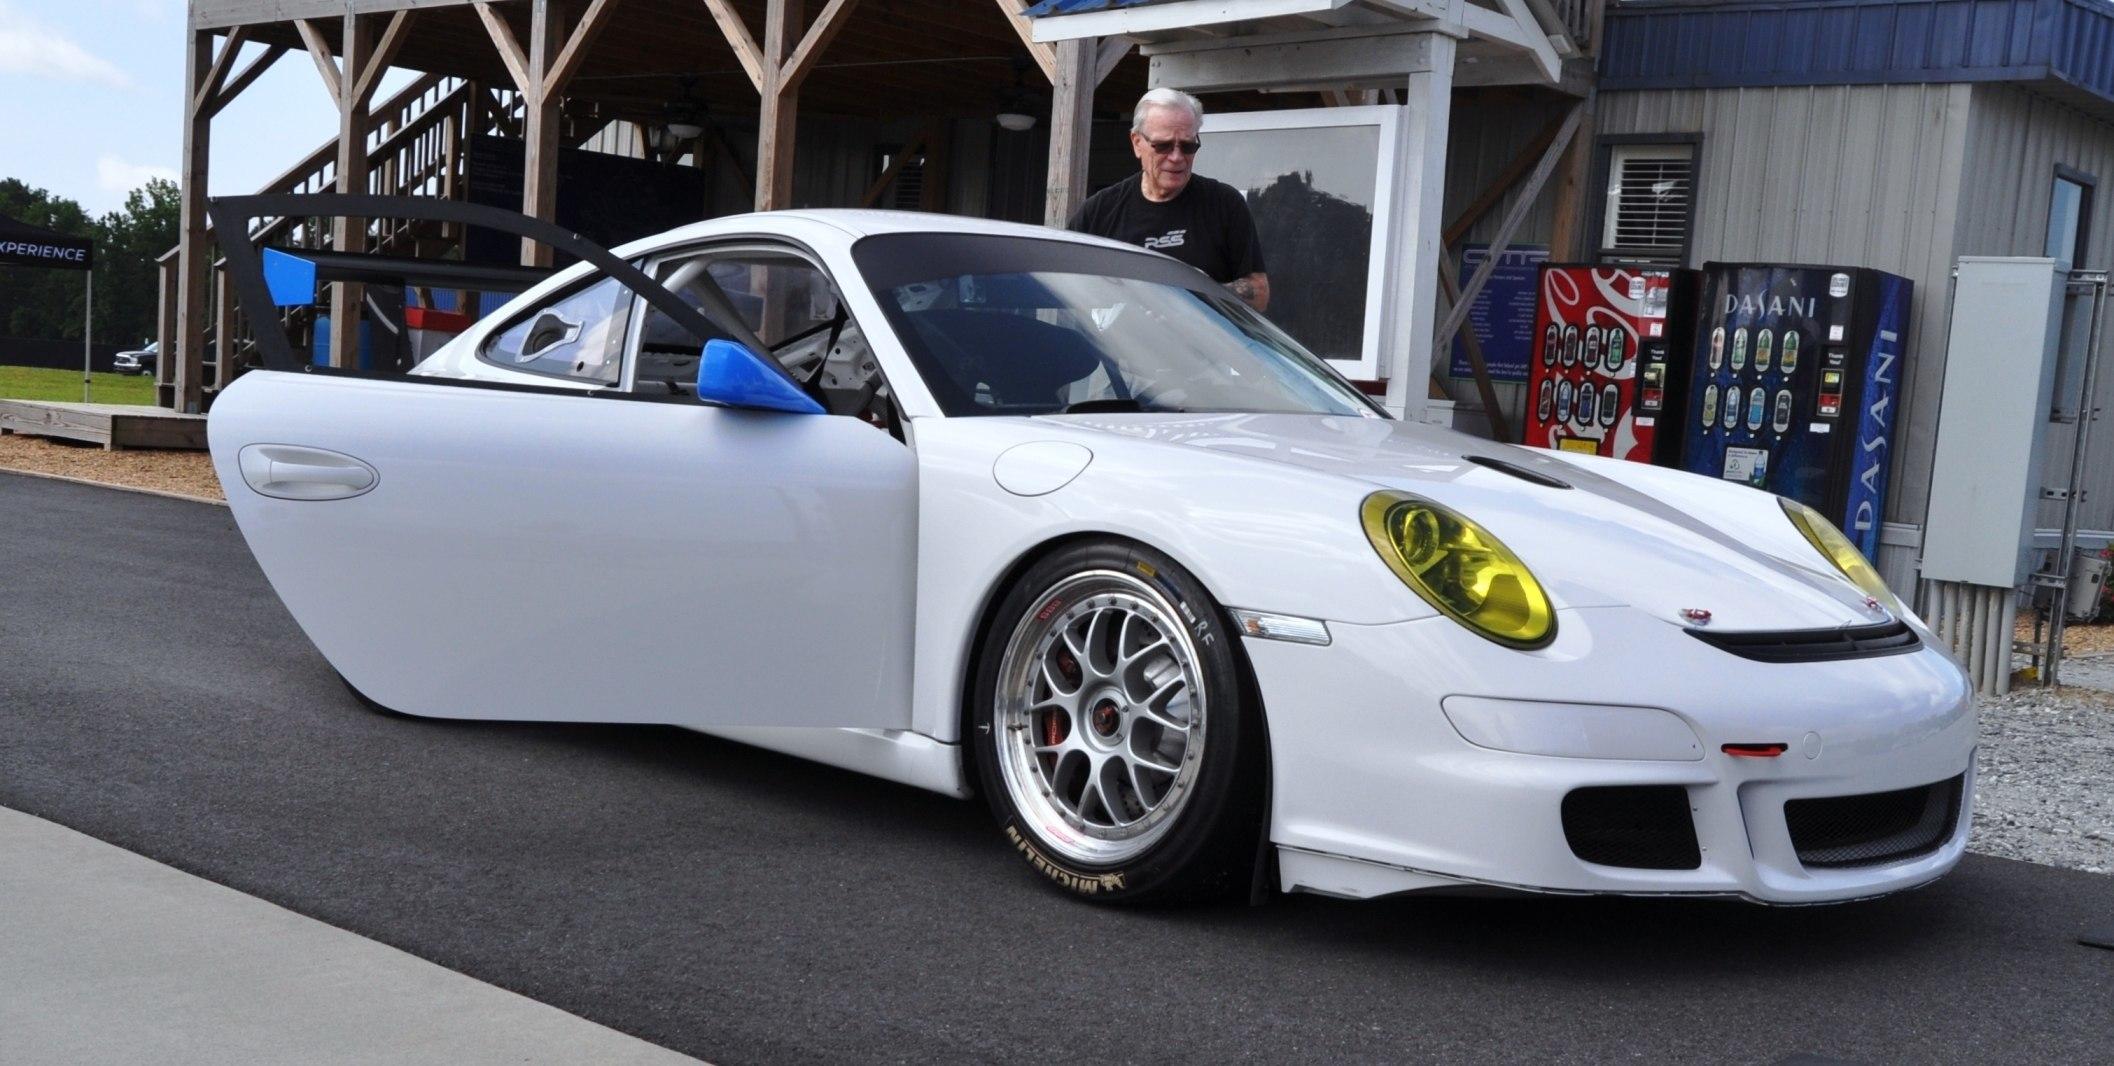 Diy Porsche 997 Supercup At Atlanta Motorsports Park Is